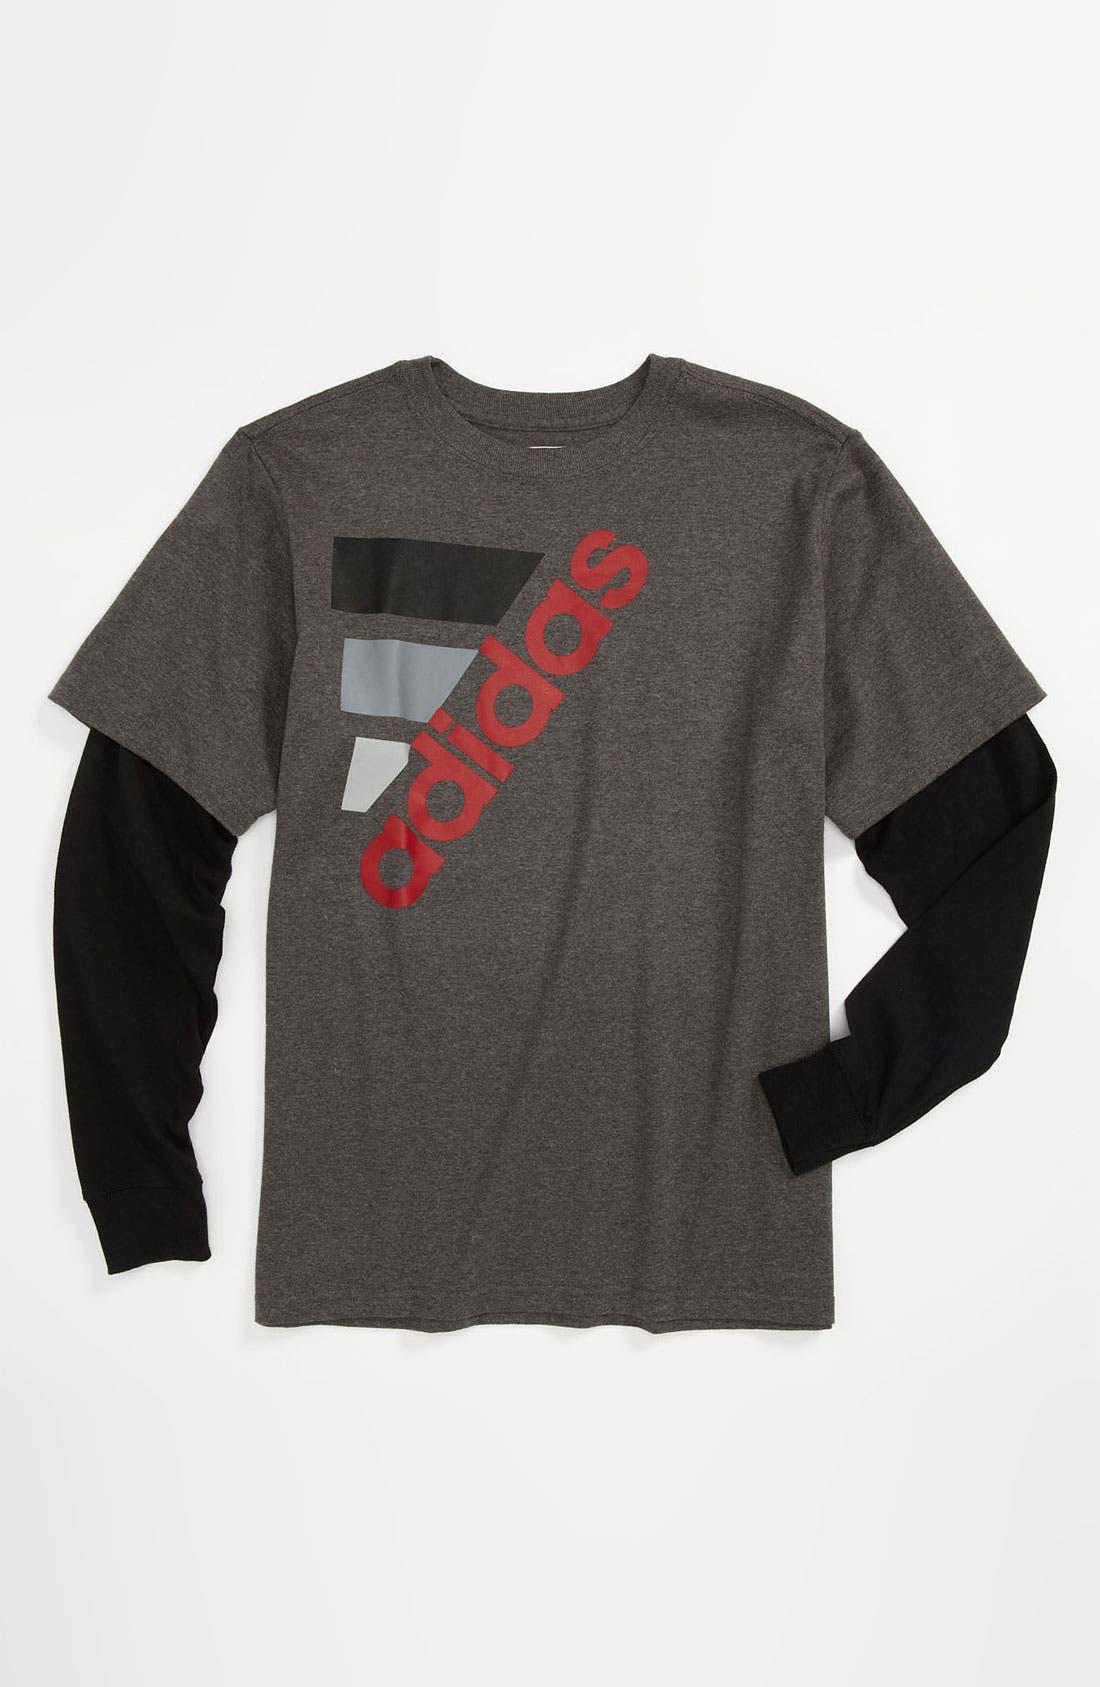 Alternate Image 1 Selected - adidas 'New Classic' Layered Sleeve Shirt (Big Boys)